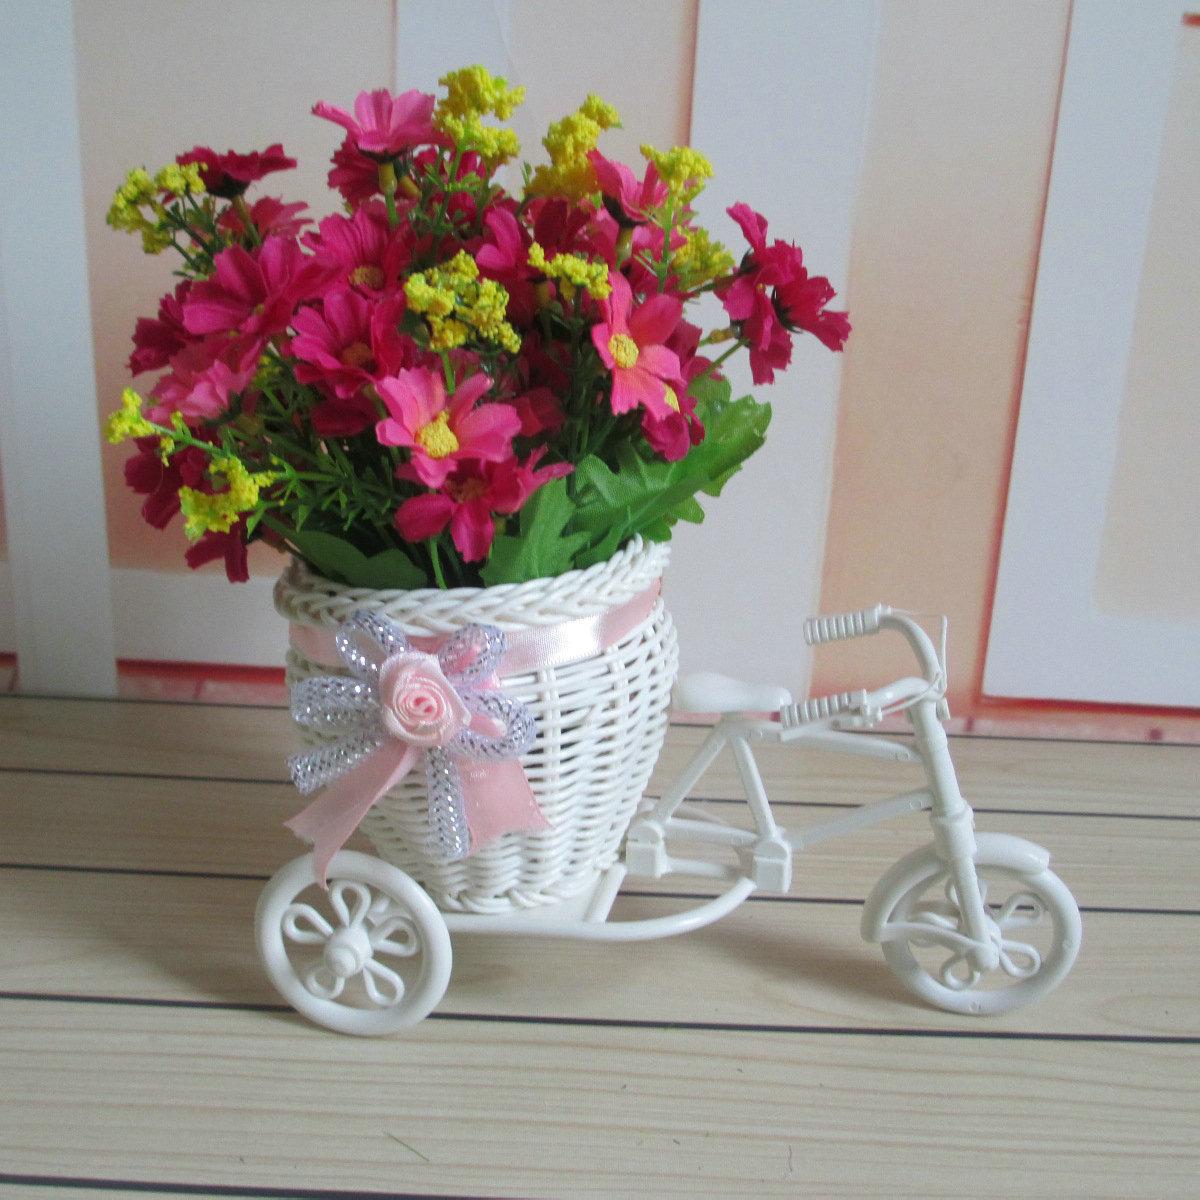 Flower Plastic Weddding Decoration White Tricycle Bike Design Flower